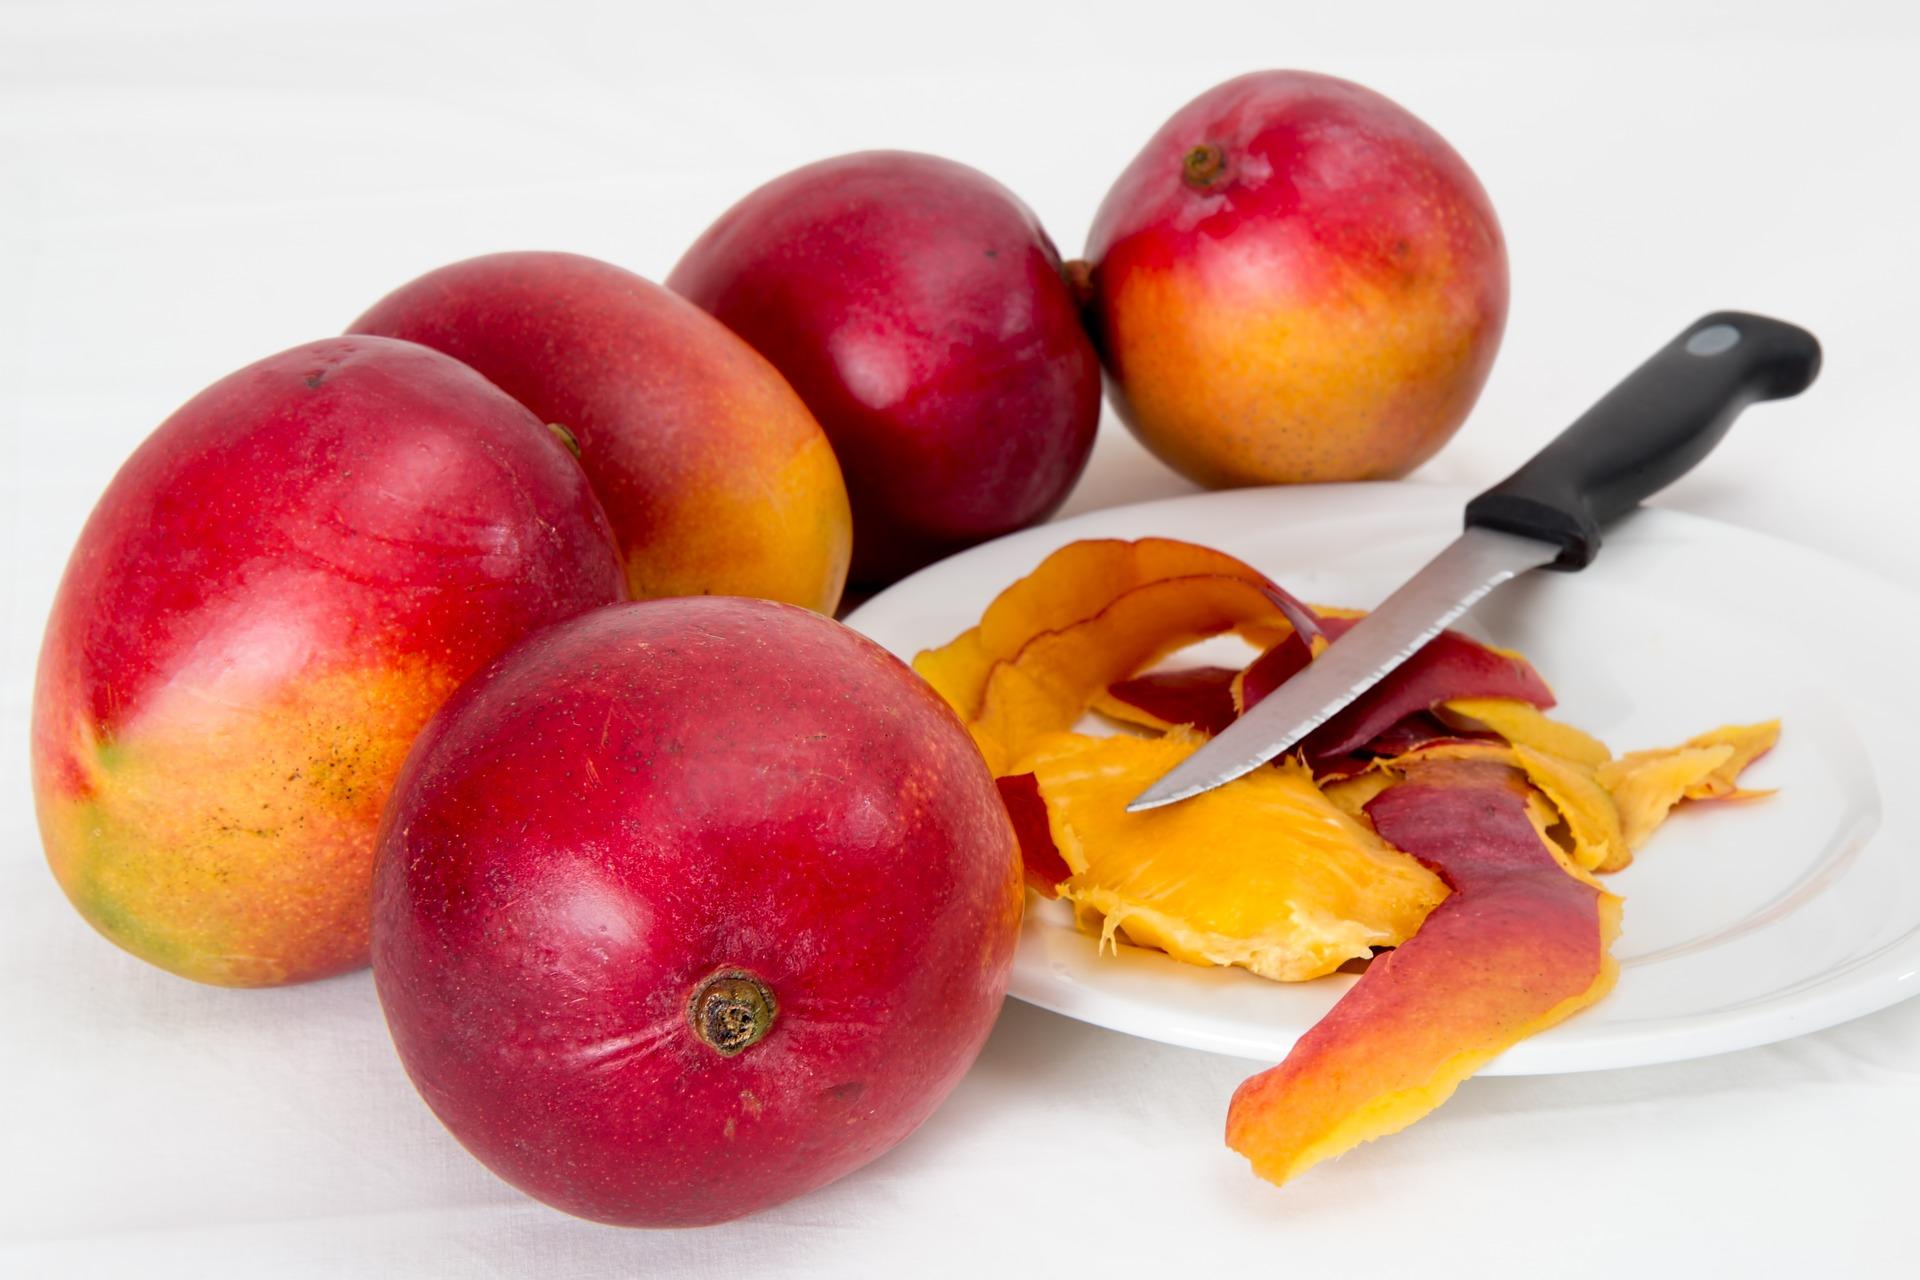 5 mango fruits around white plate with knife and mango peels